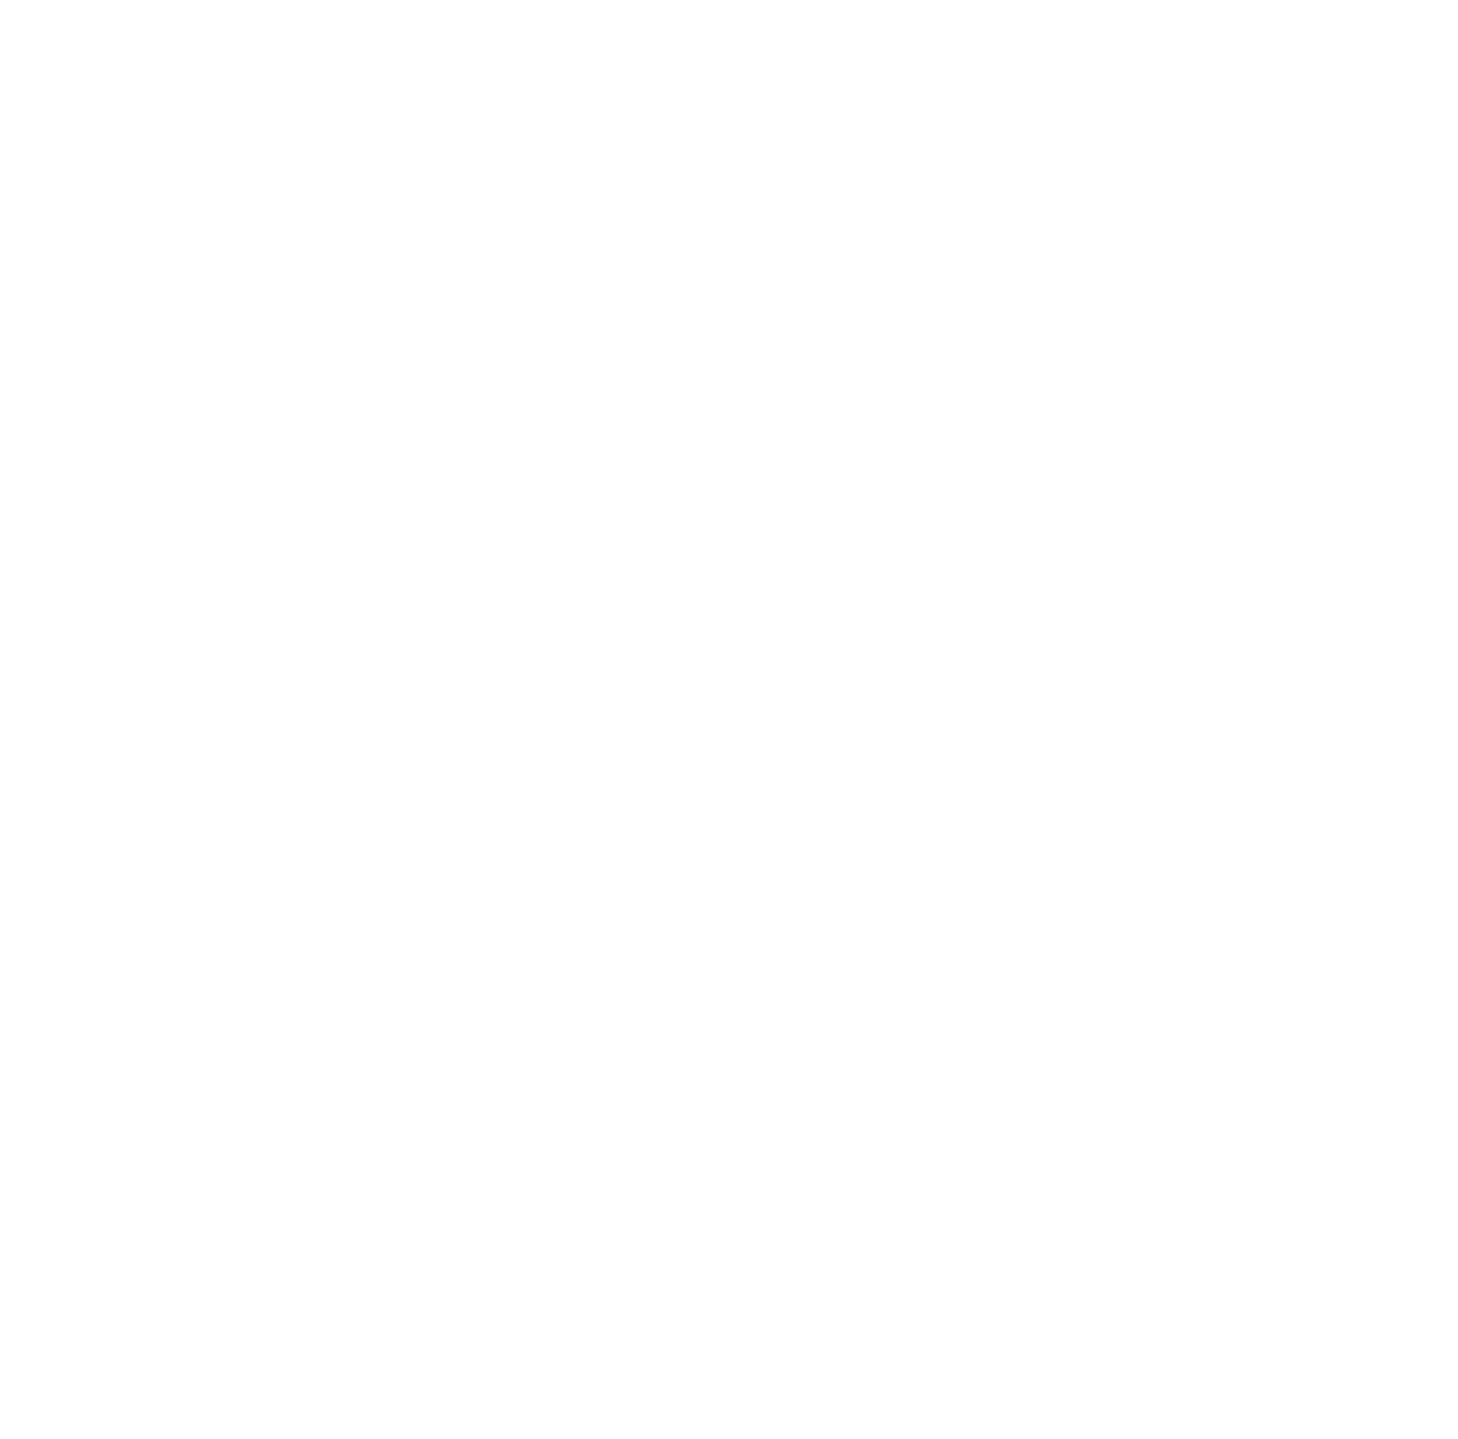 bpg logo symbol only rgb � white transparent